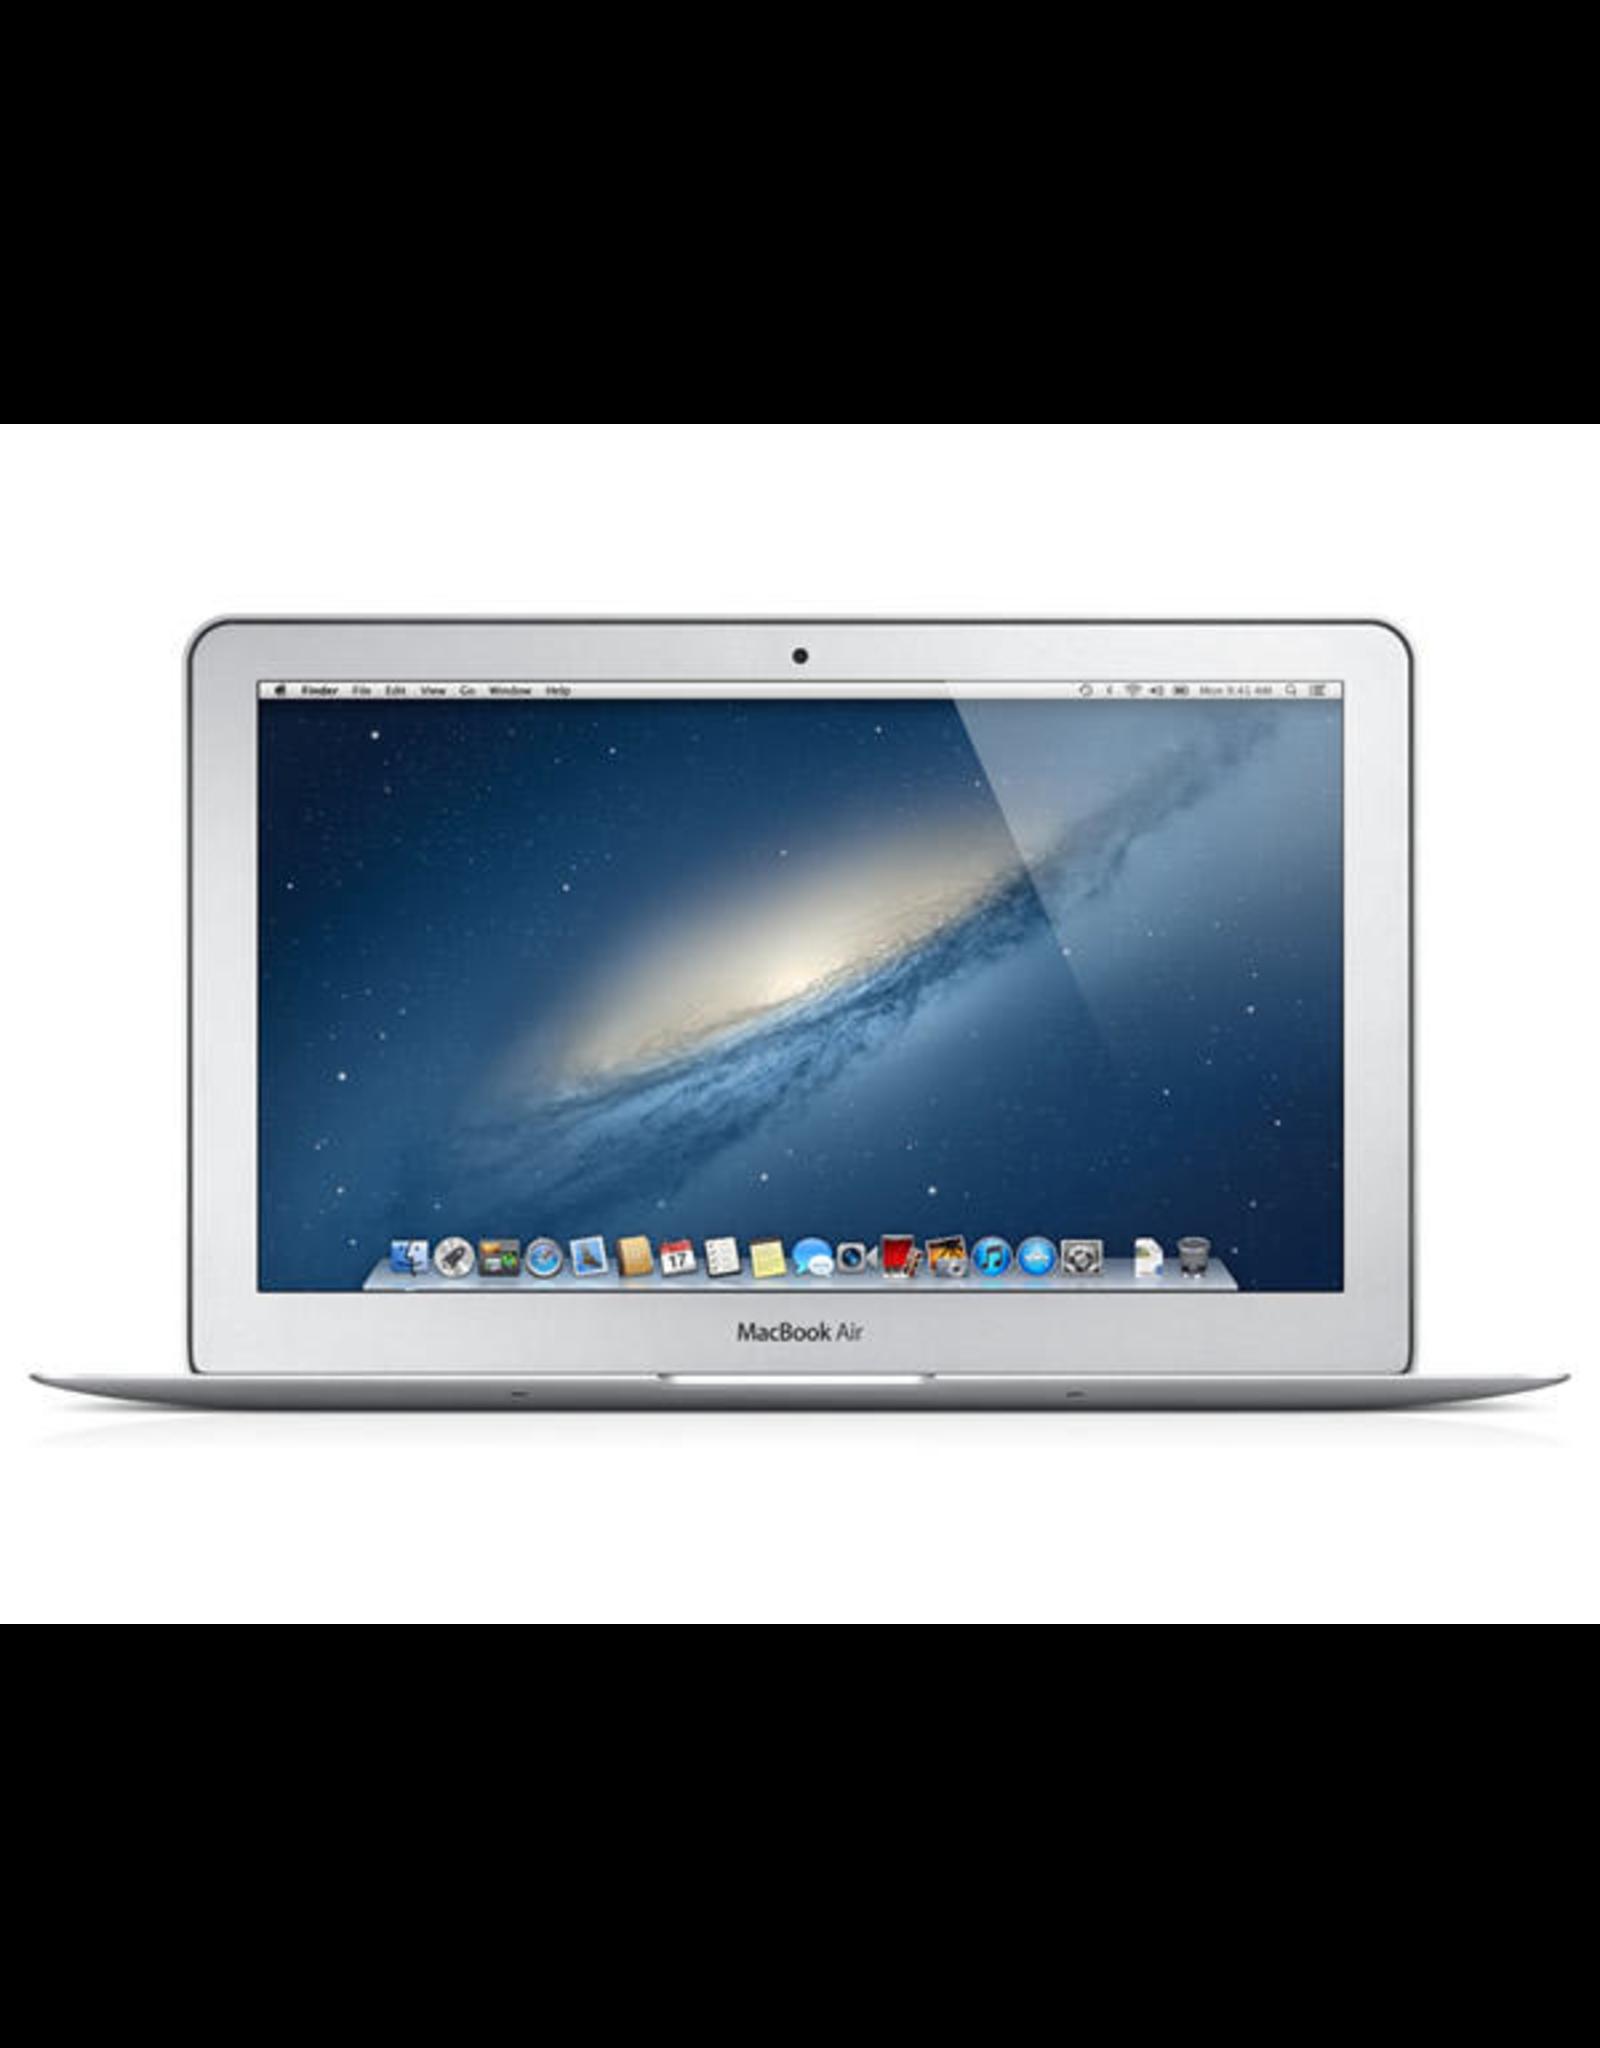 Apple Apple MacBook Air 11 inch 1.3GHZ /4GB/256GB